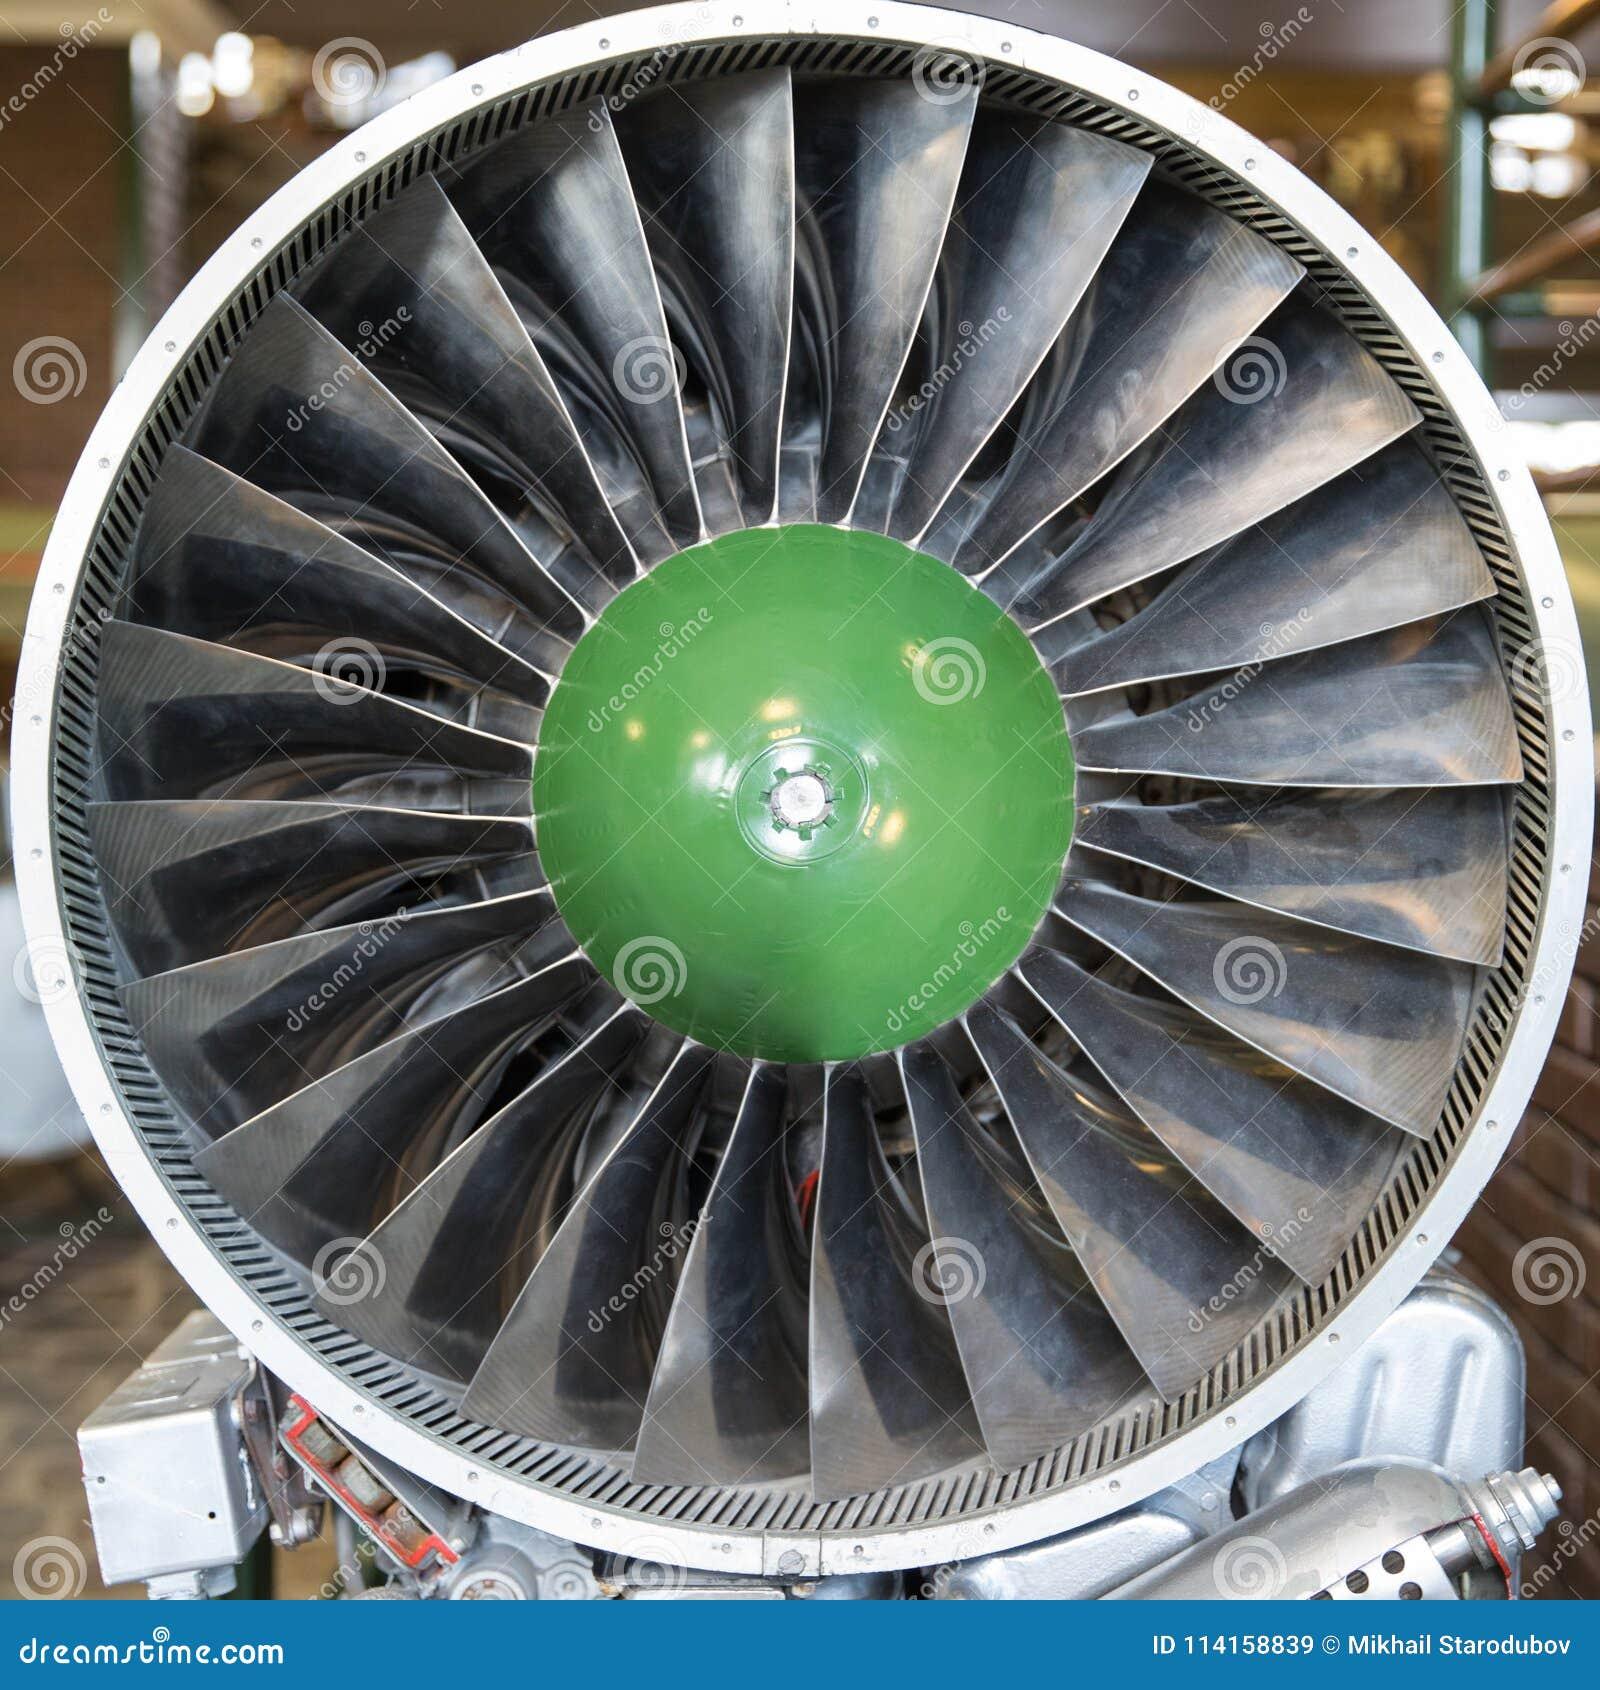 Turbine Blades Of Turbo Jet Engine For Plane, Aircraft